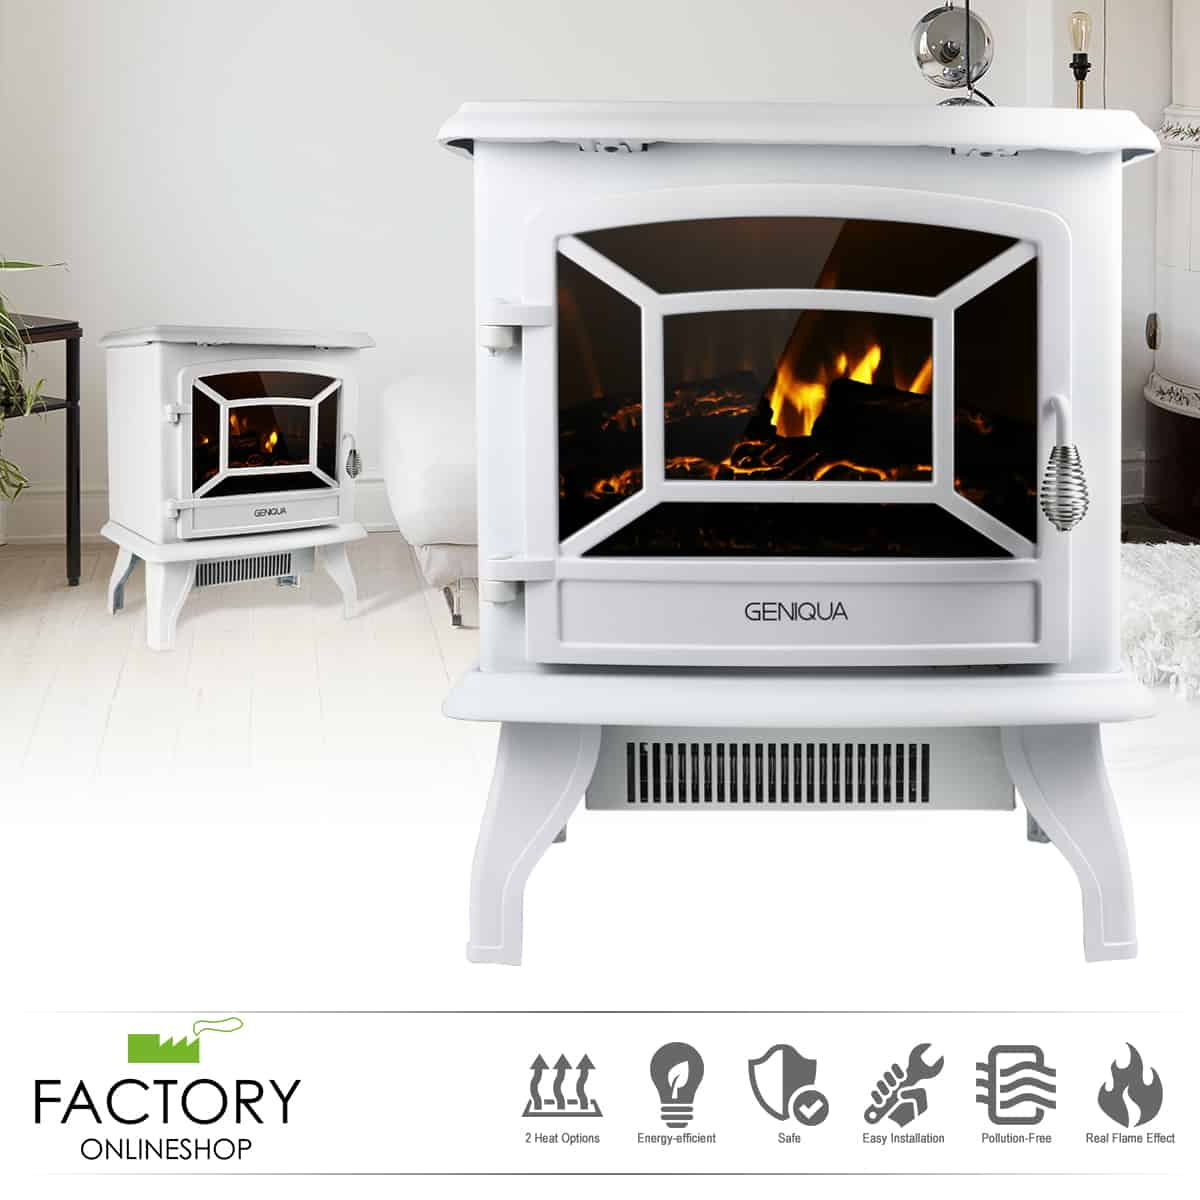 Geniqua White 17 Electric Fireplace Heater Freestanding Wood Fire Led Flame Warm Stove Fireplacess Com